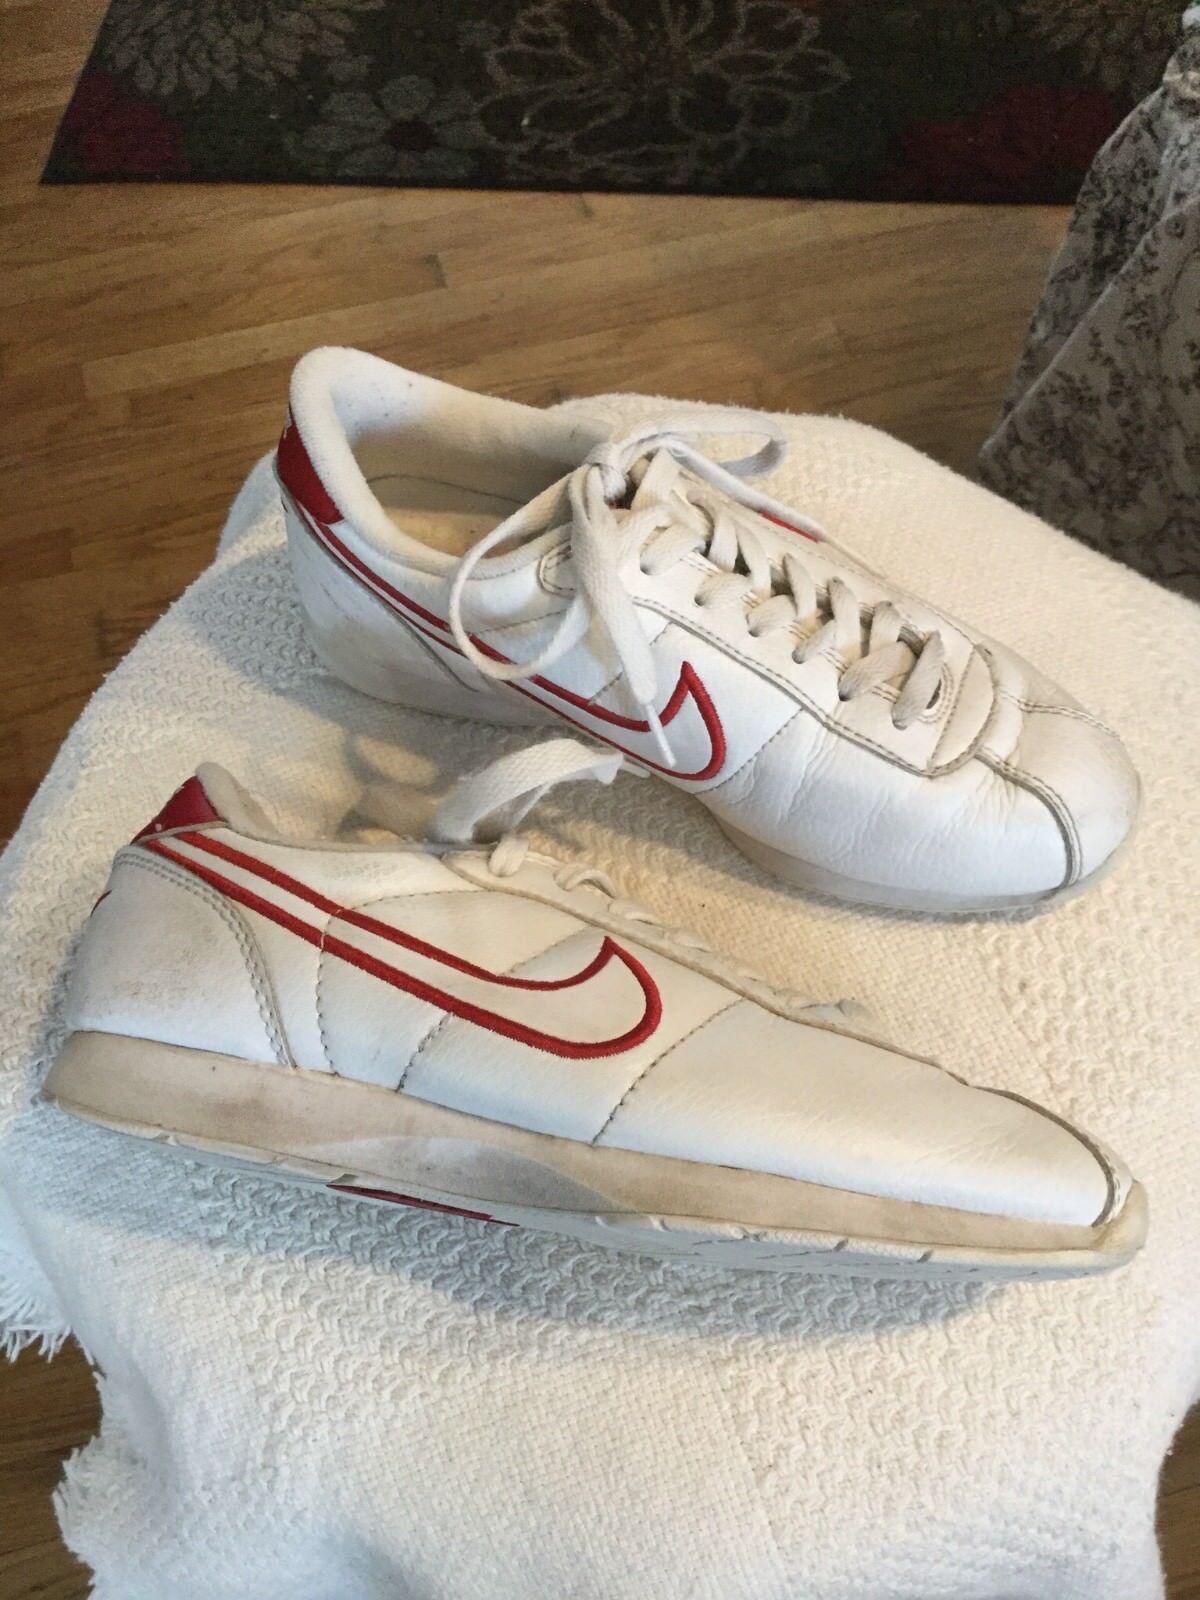 Nike Womens Vintage original stamina Leather Size 6 White/Red swoosh 2000